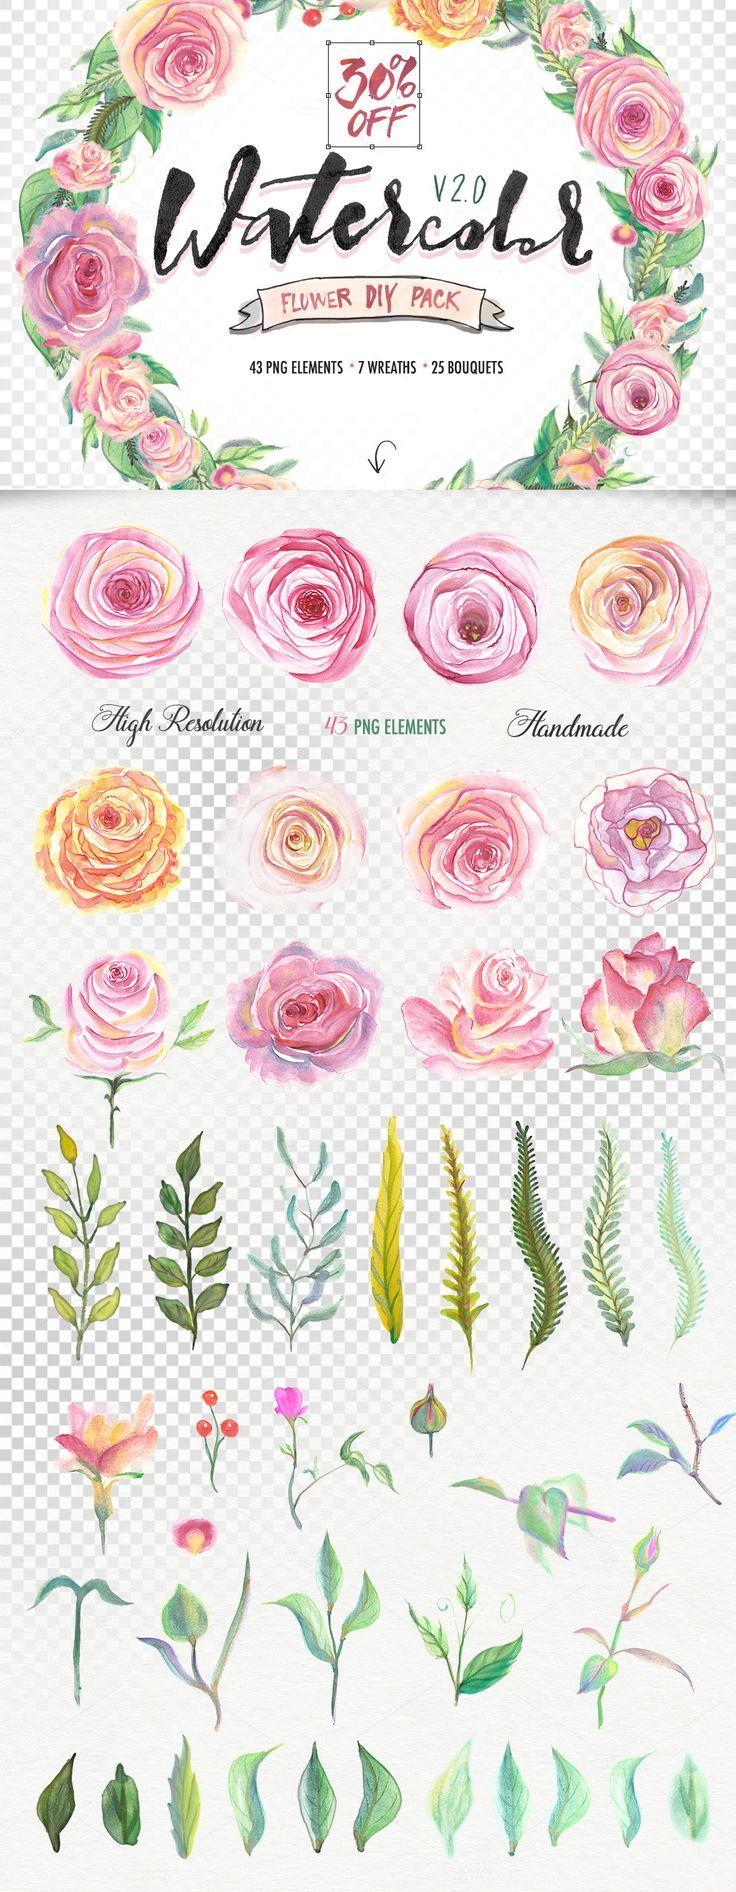 The Beautiful October Bundle Watercolor flowers